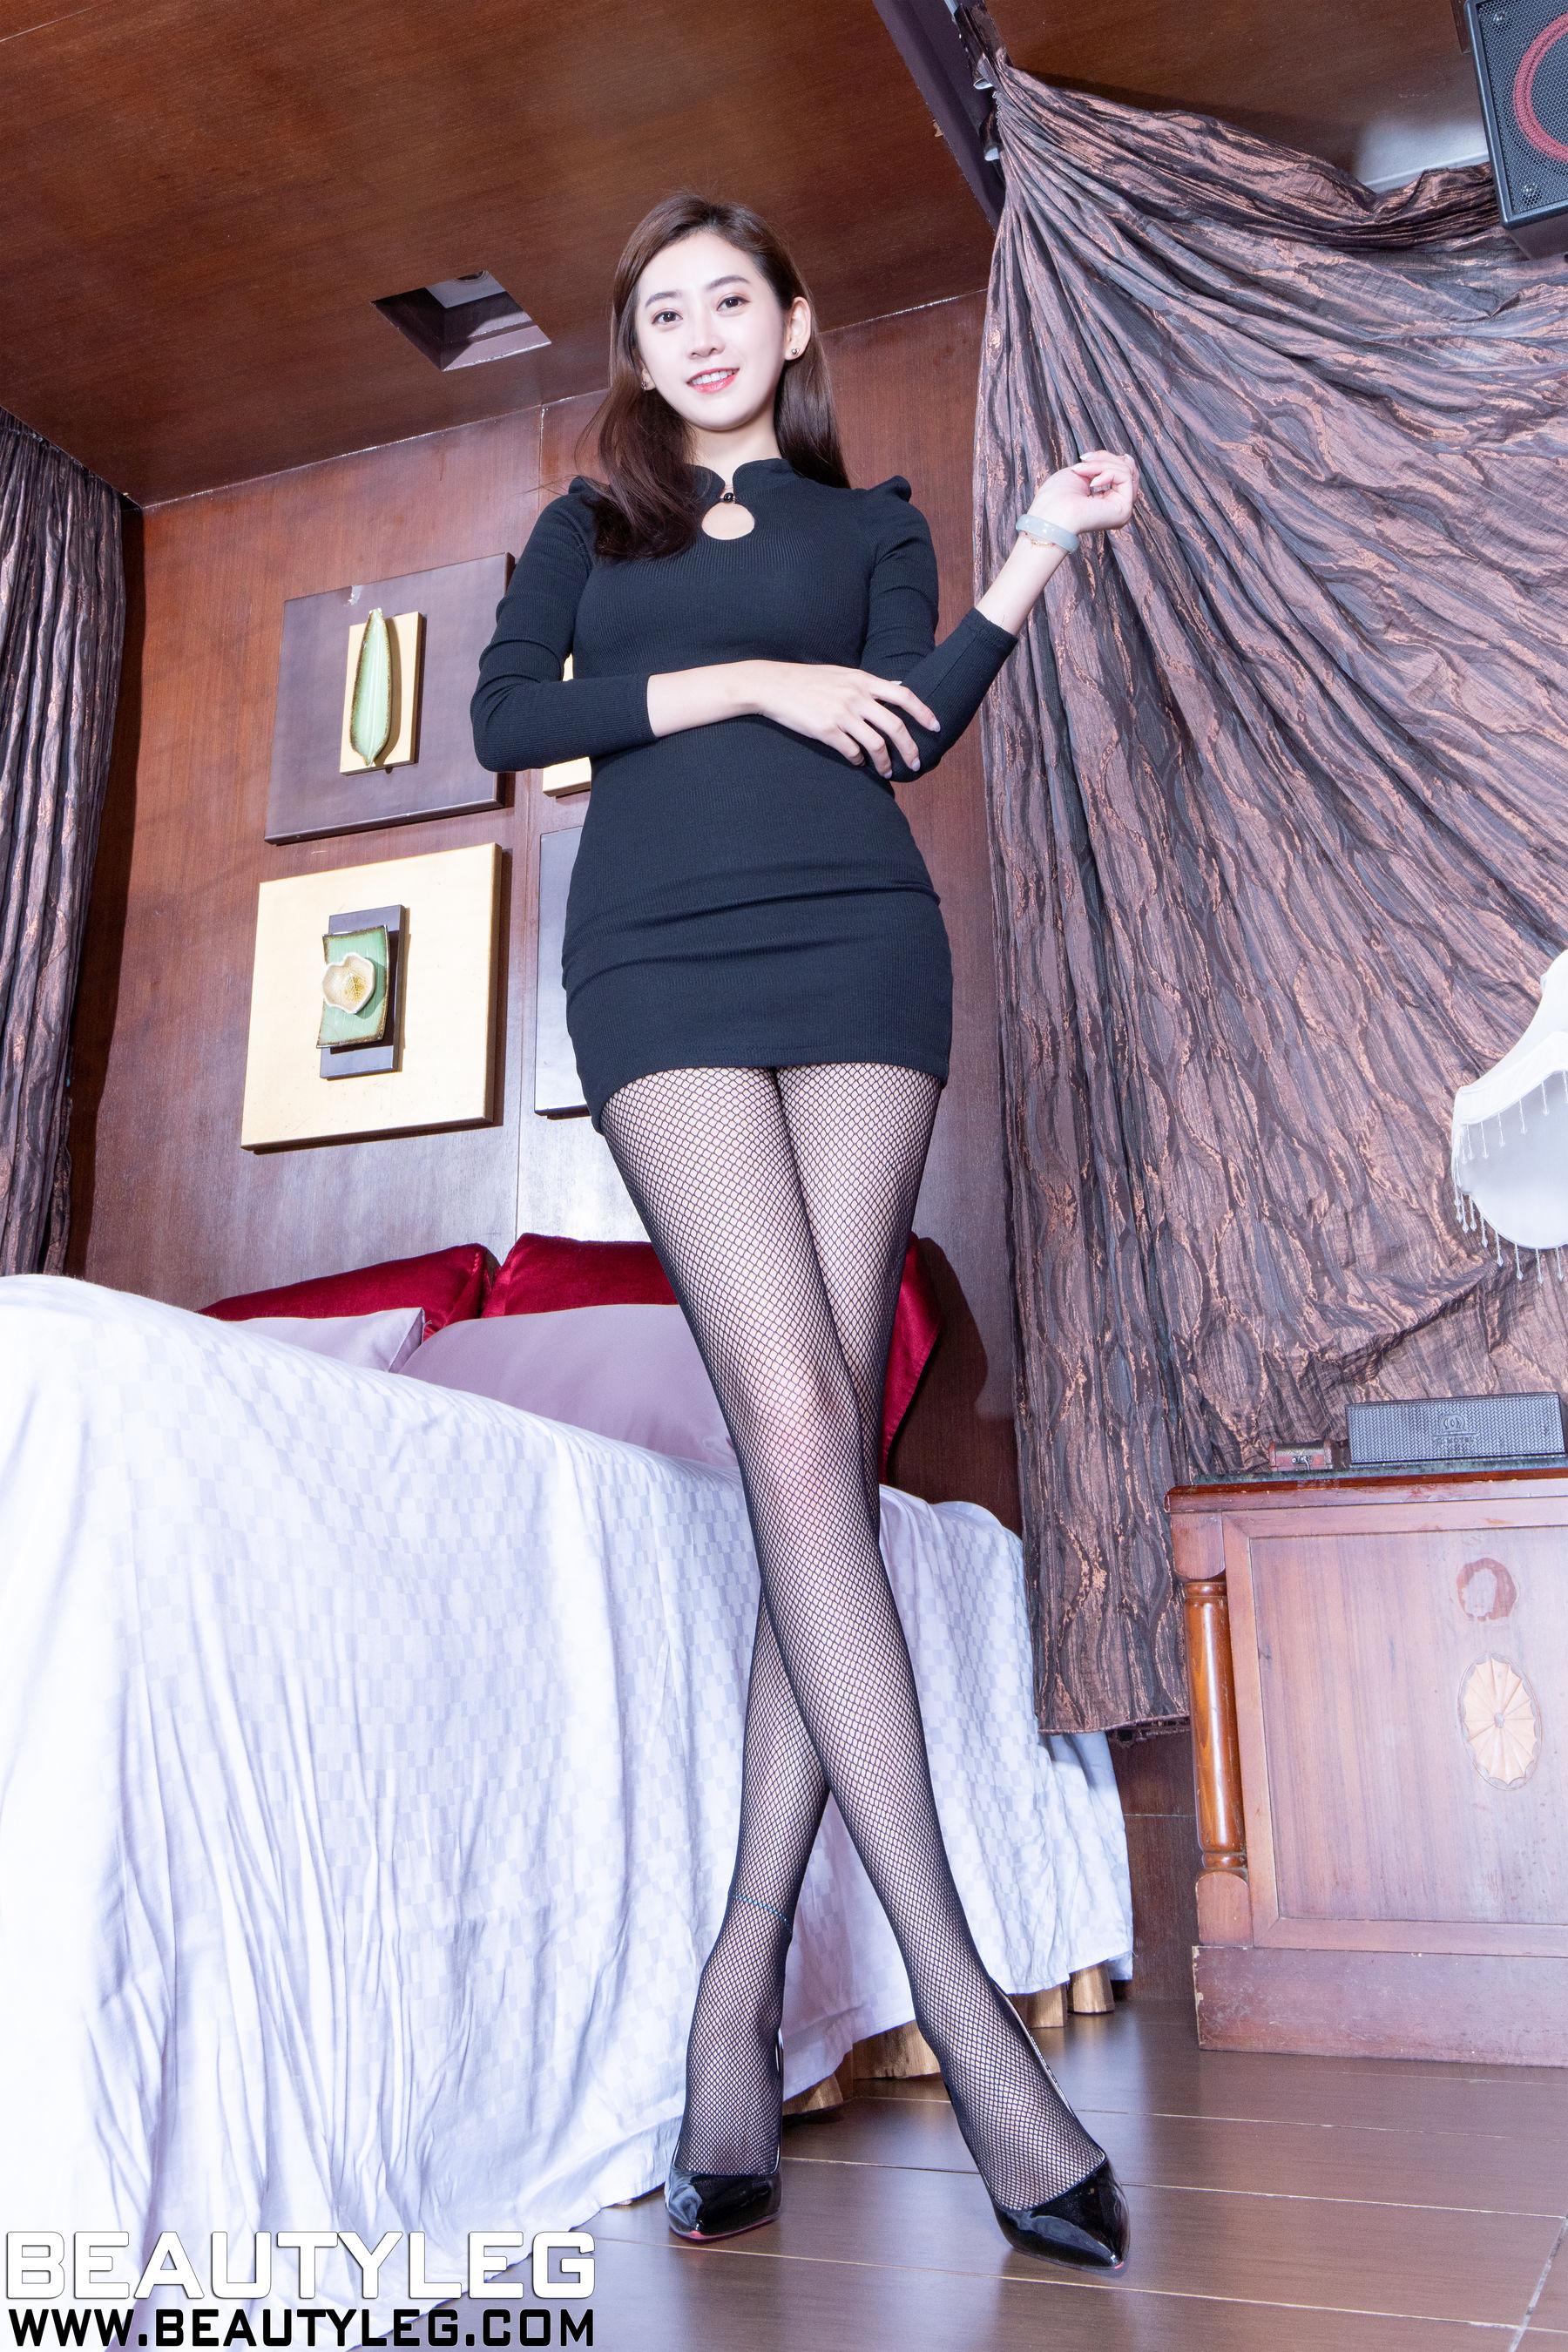 VOL.1748 [Beautyleg]长腿美女:Leonie超高清个人性感漂亮大图(53P)